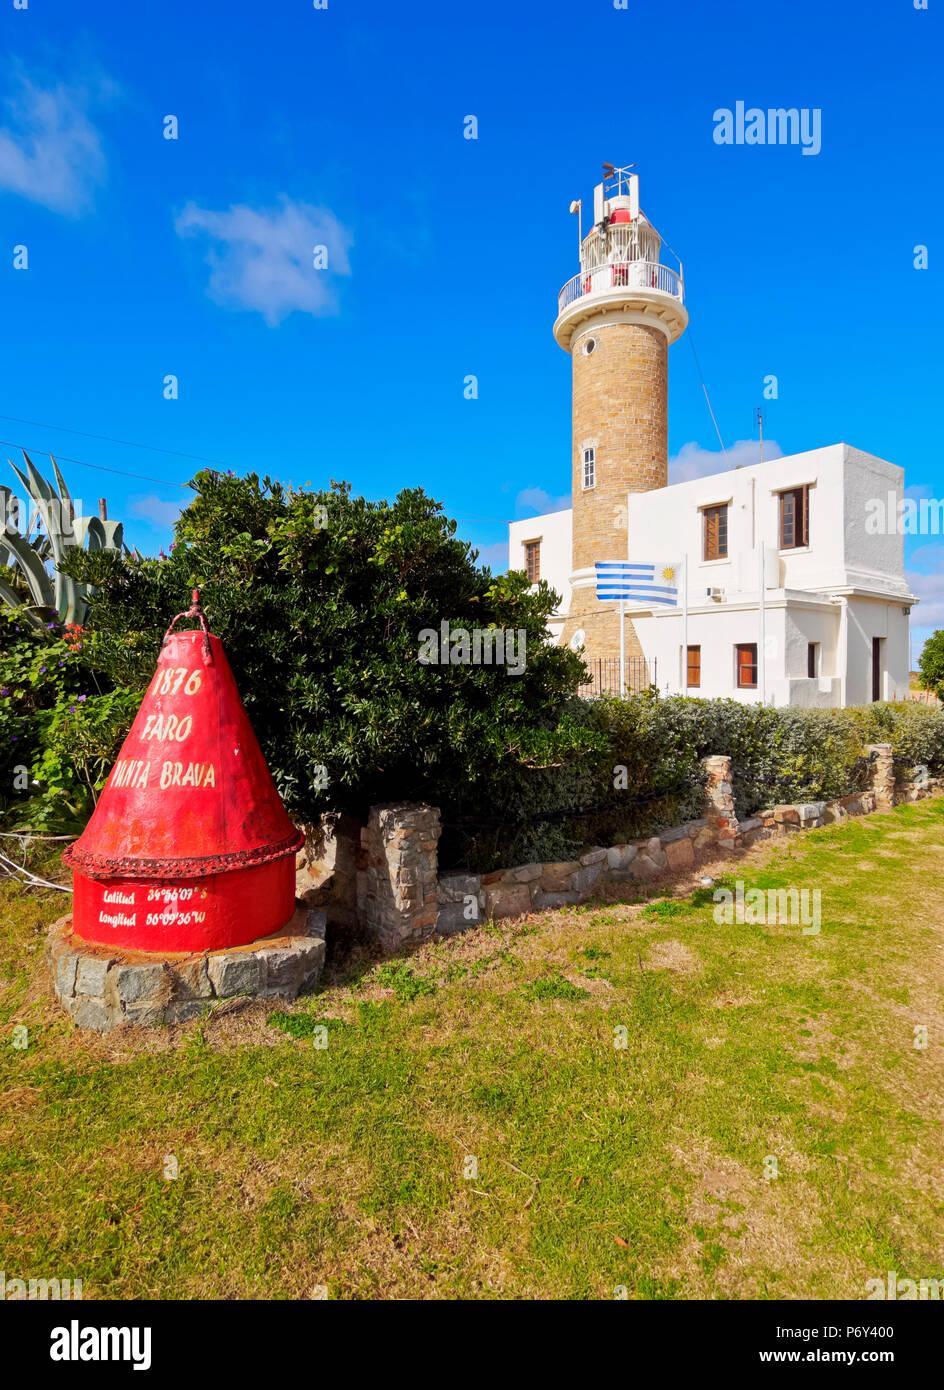 Uruguay, Montevideo, View of the Punta Brava Lighthouse. - Stock Image